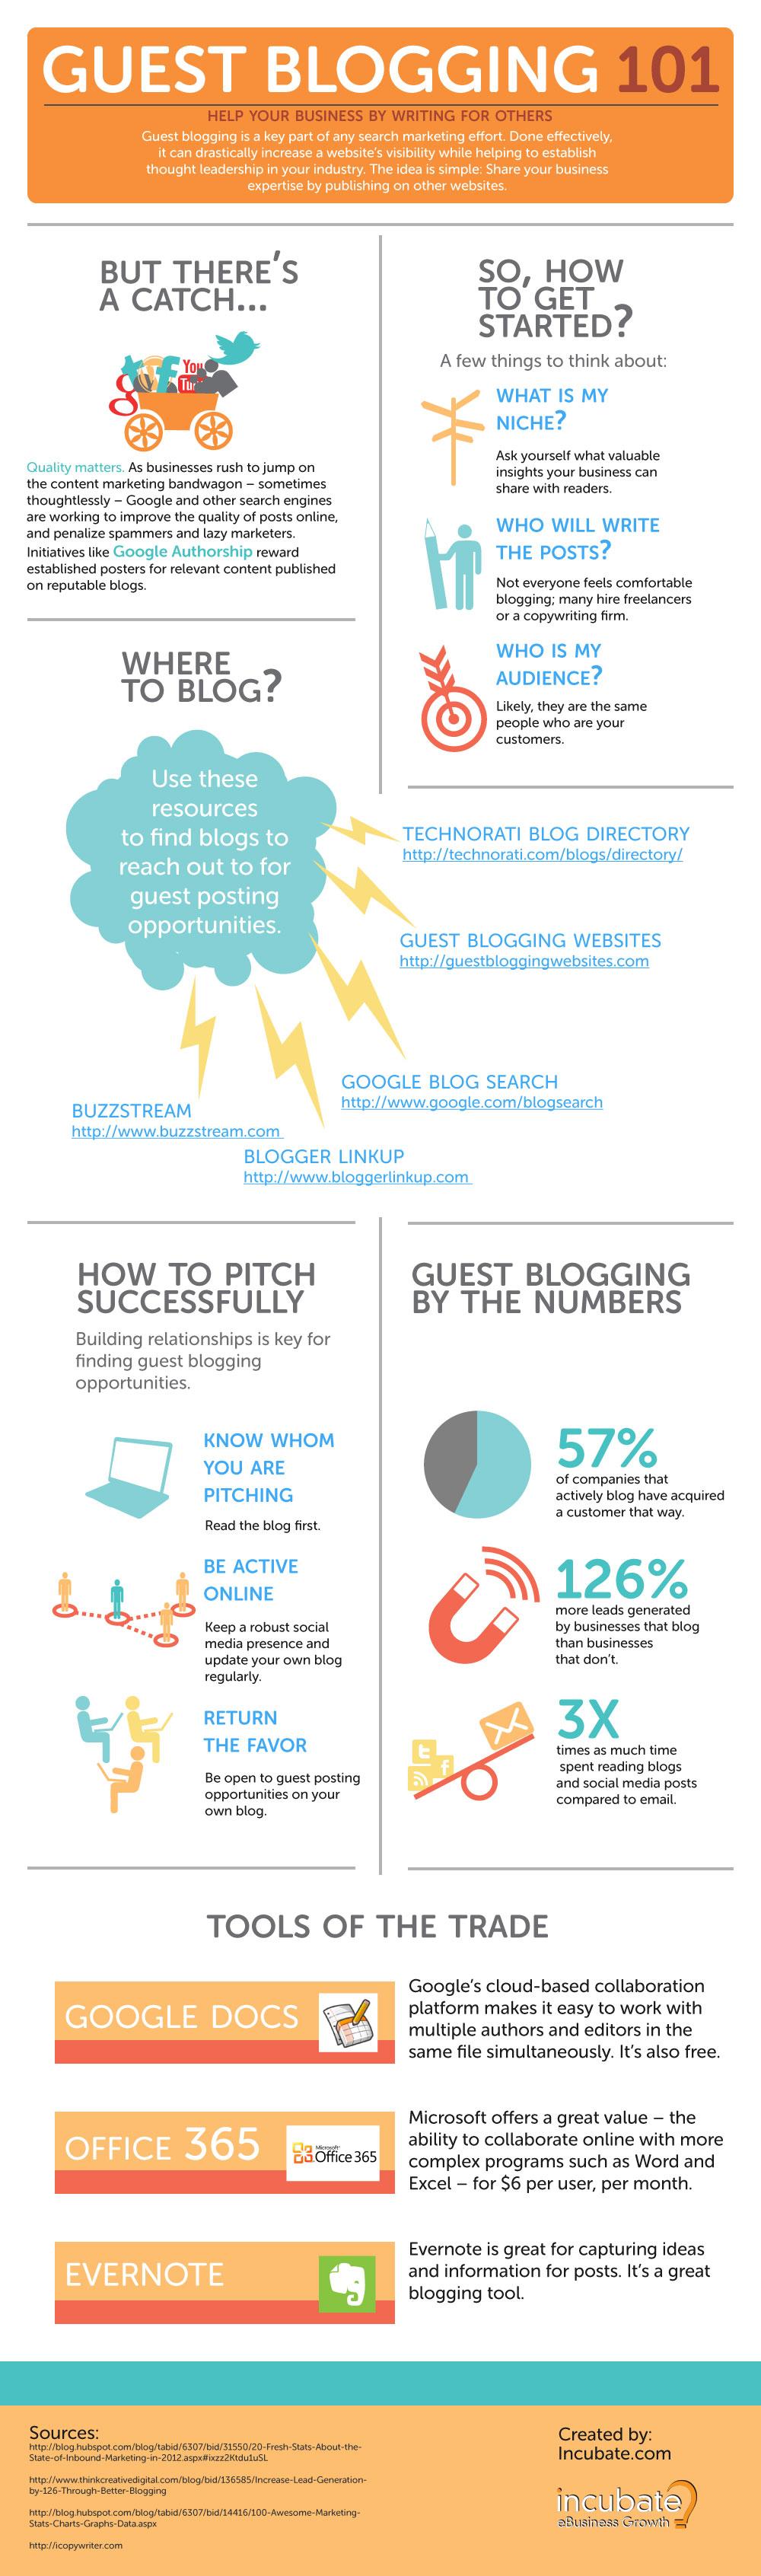 Guest Blogging 101